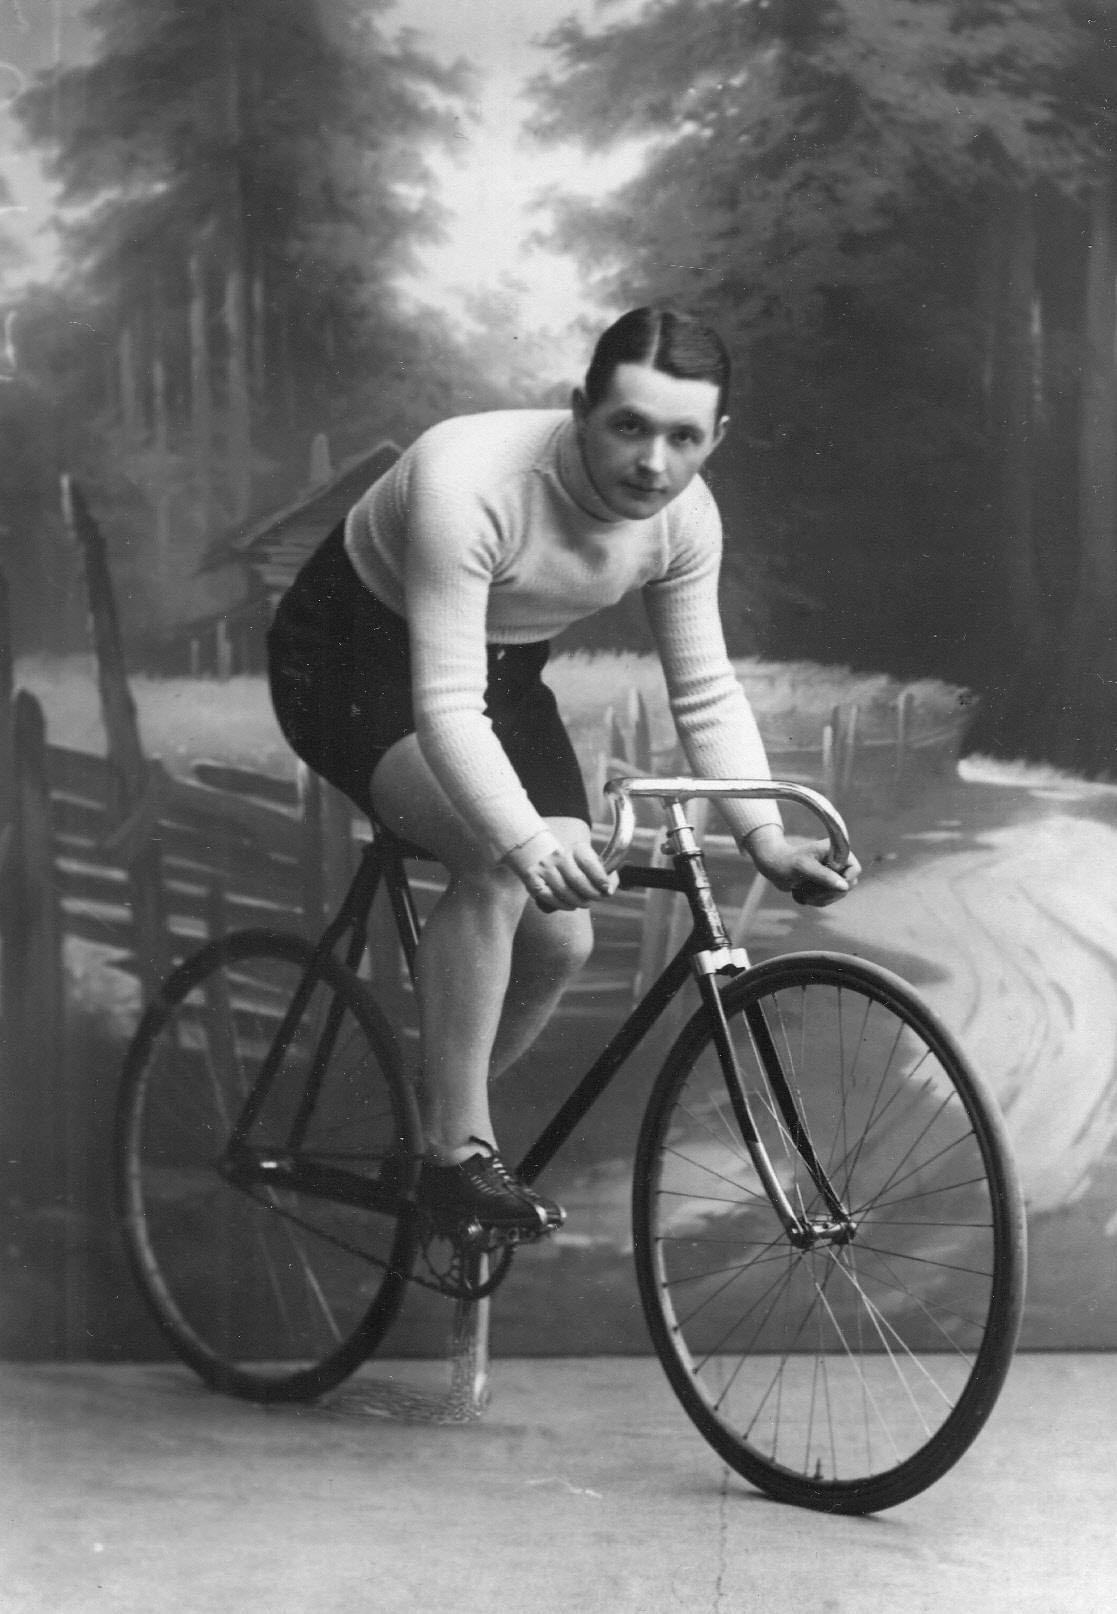 Участник велогонок Ткачик (Варшава) на велосипеде